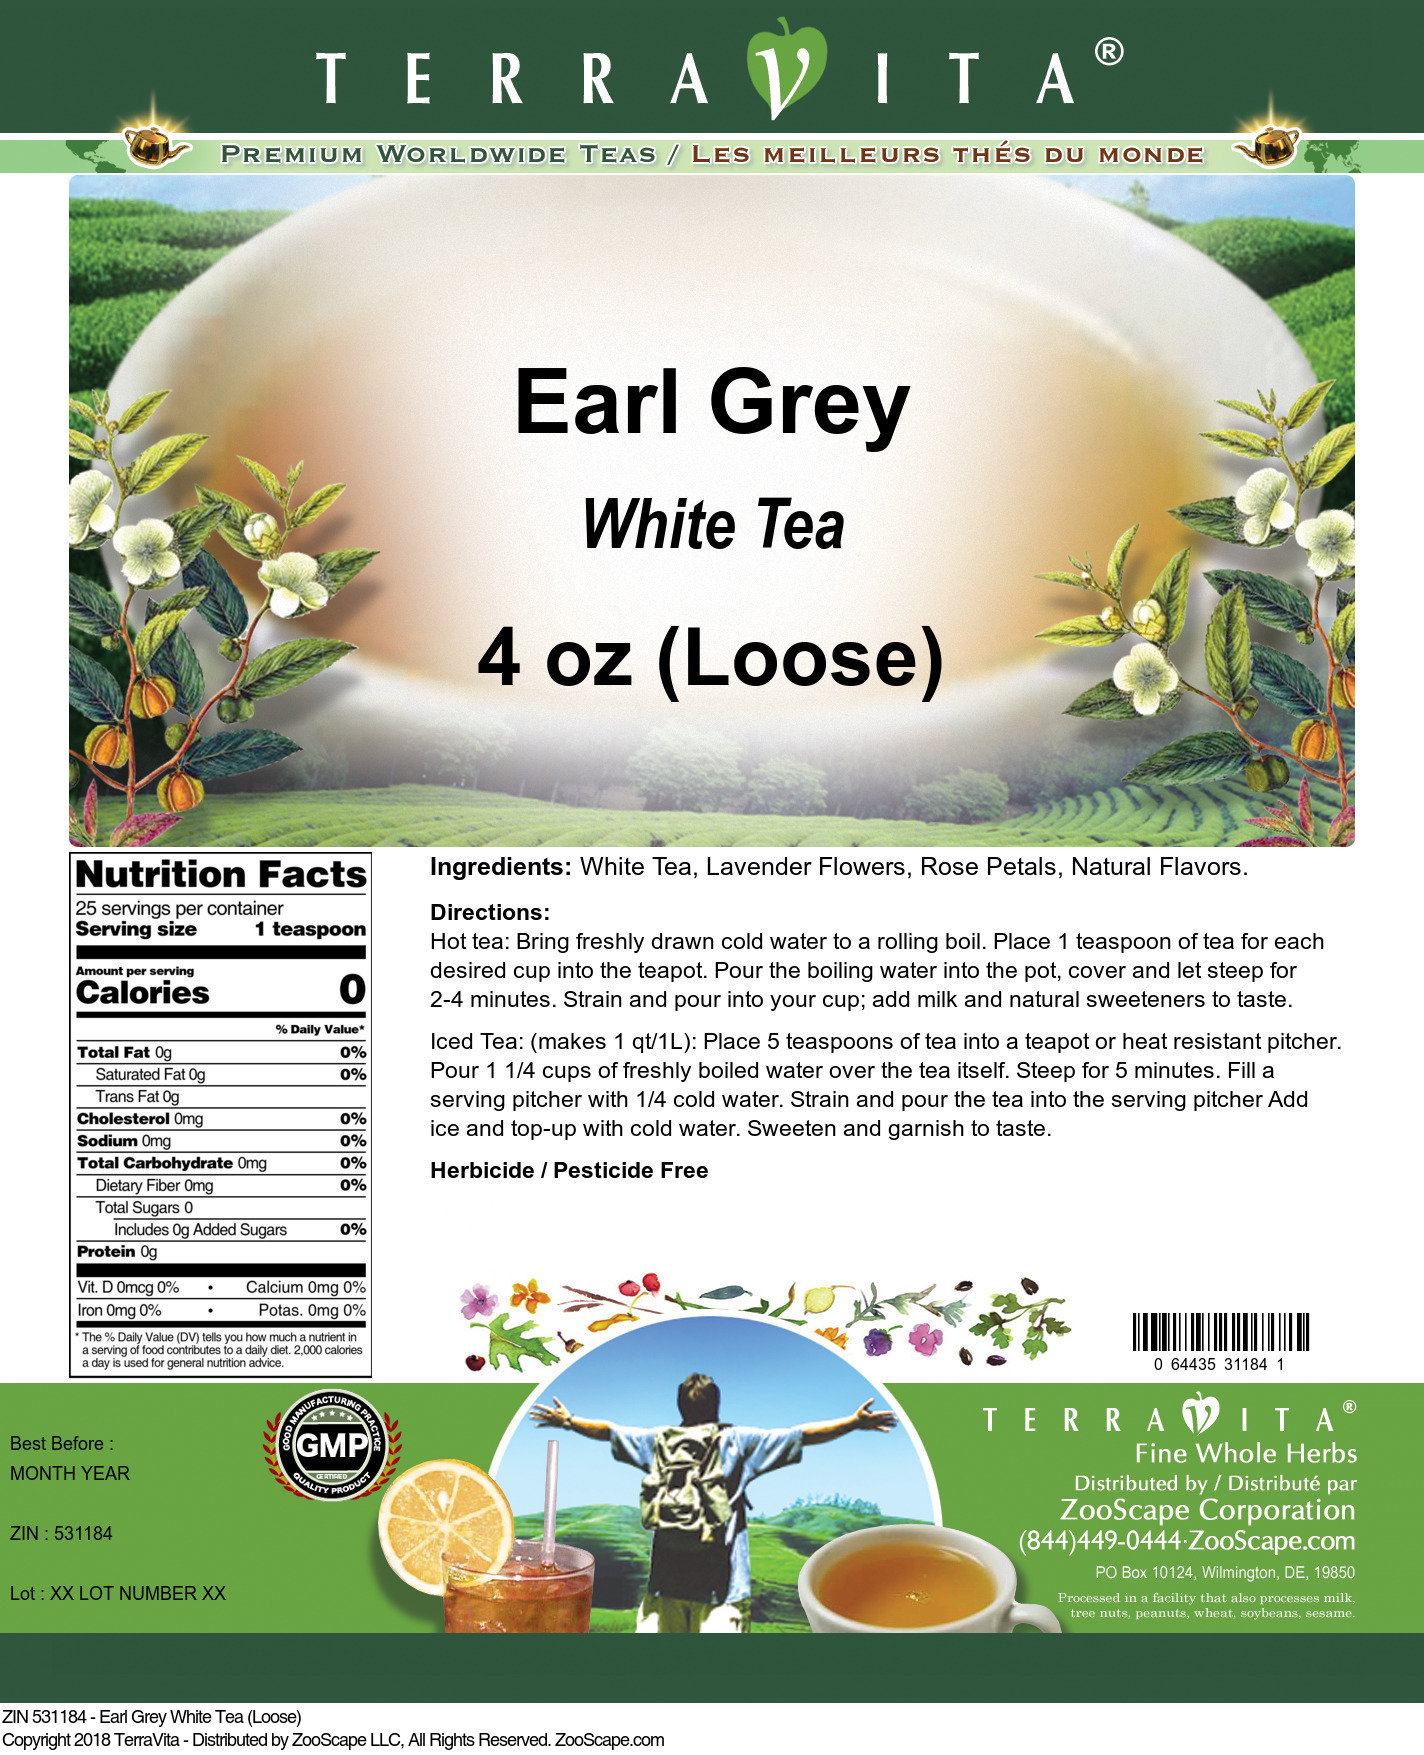 Earl Grey White Tea (Loose)